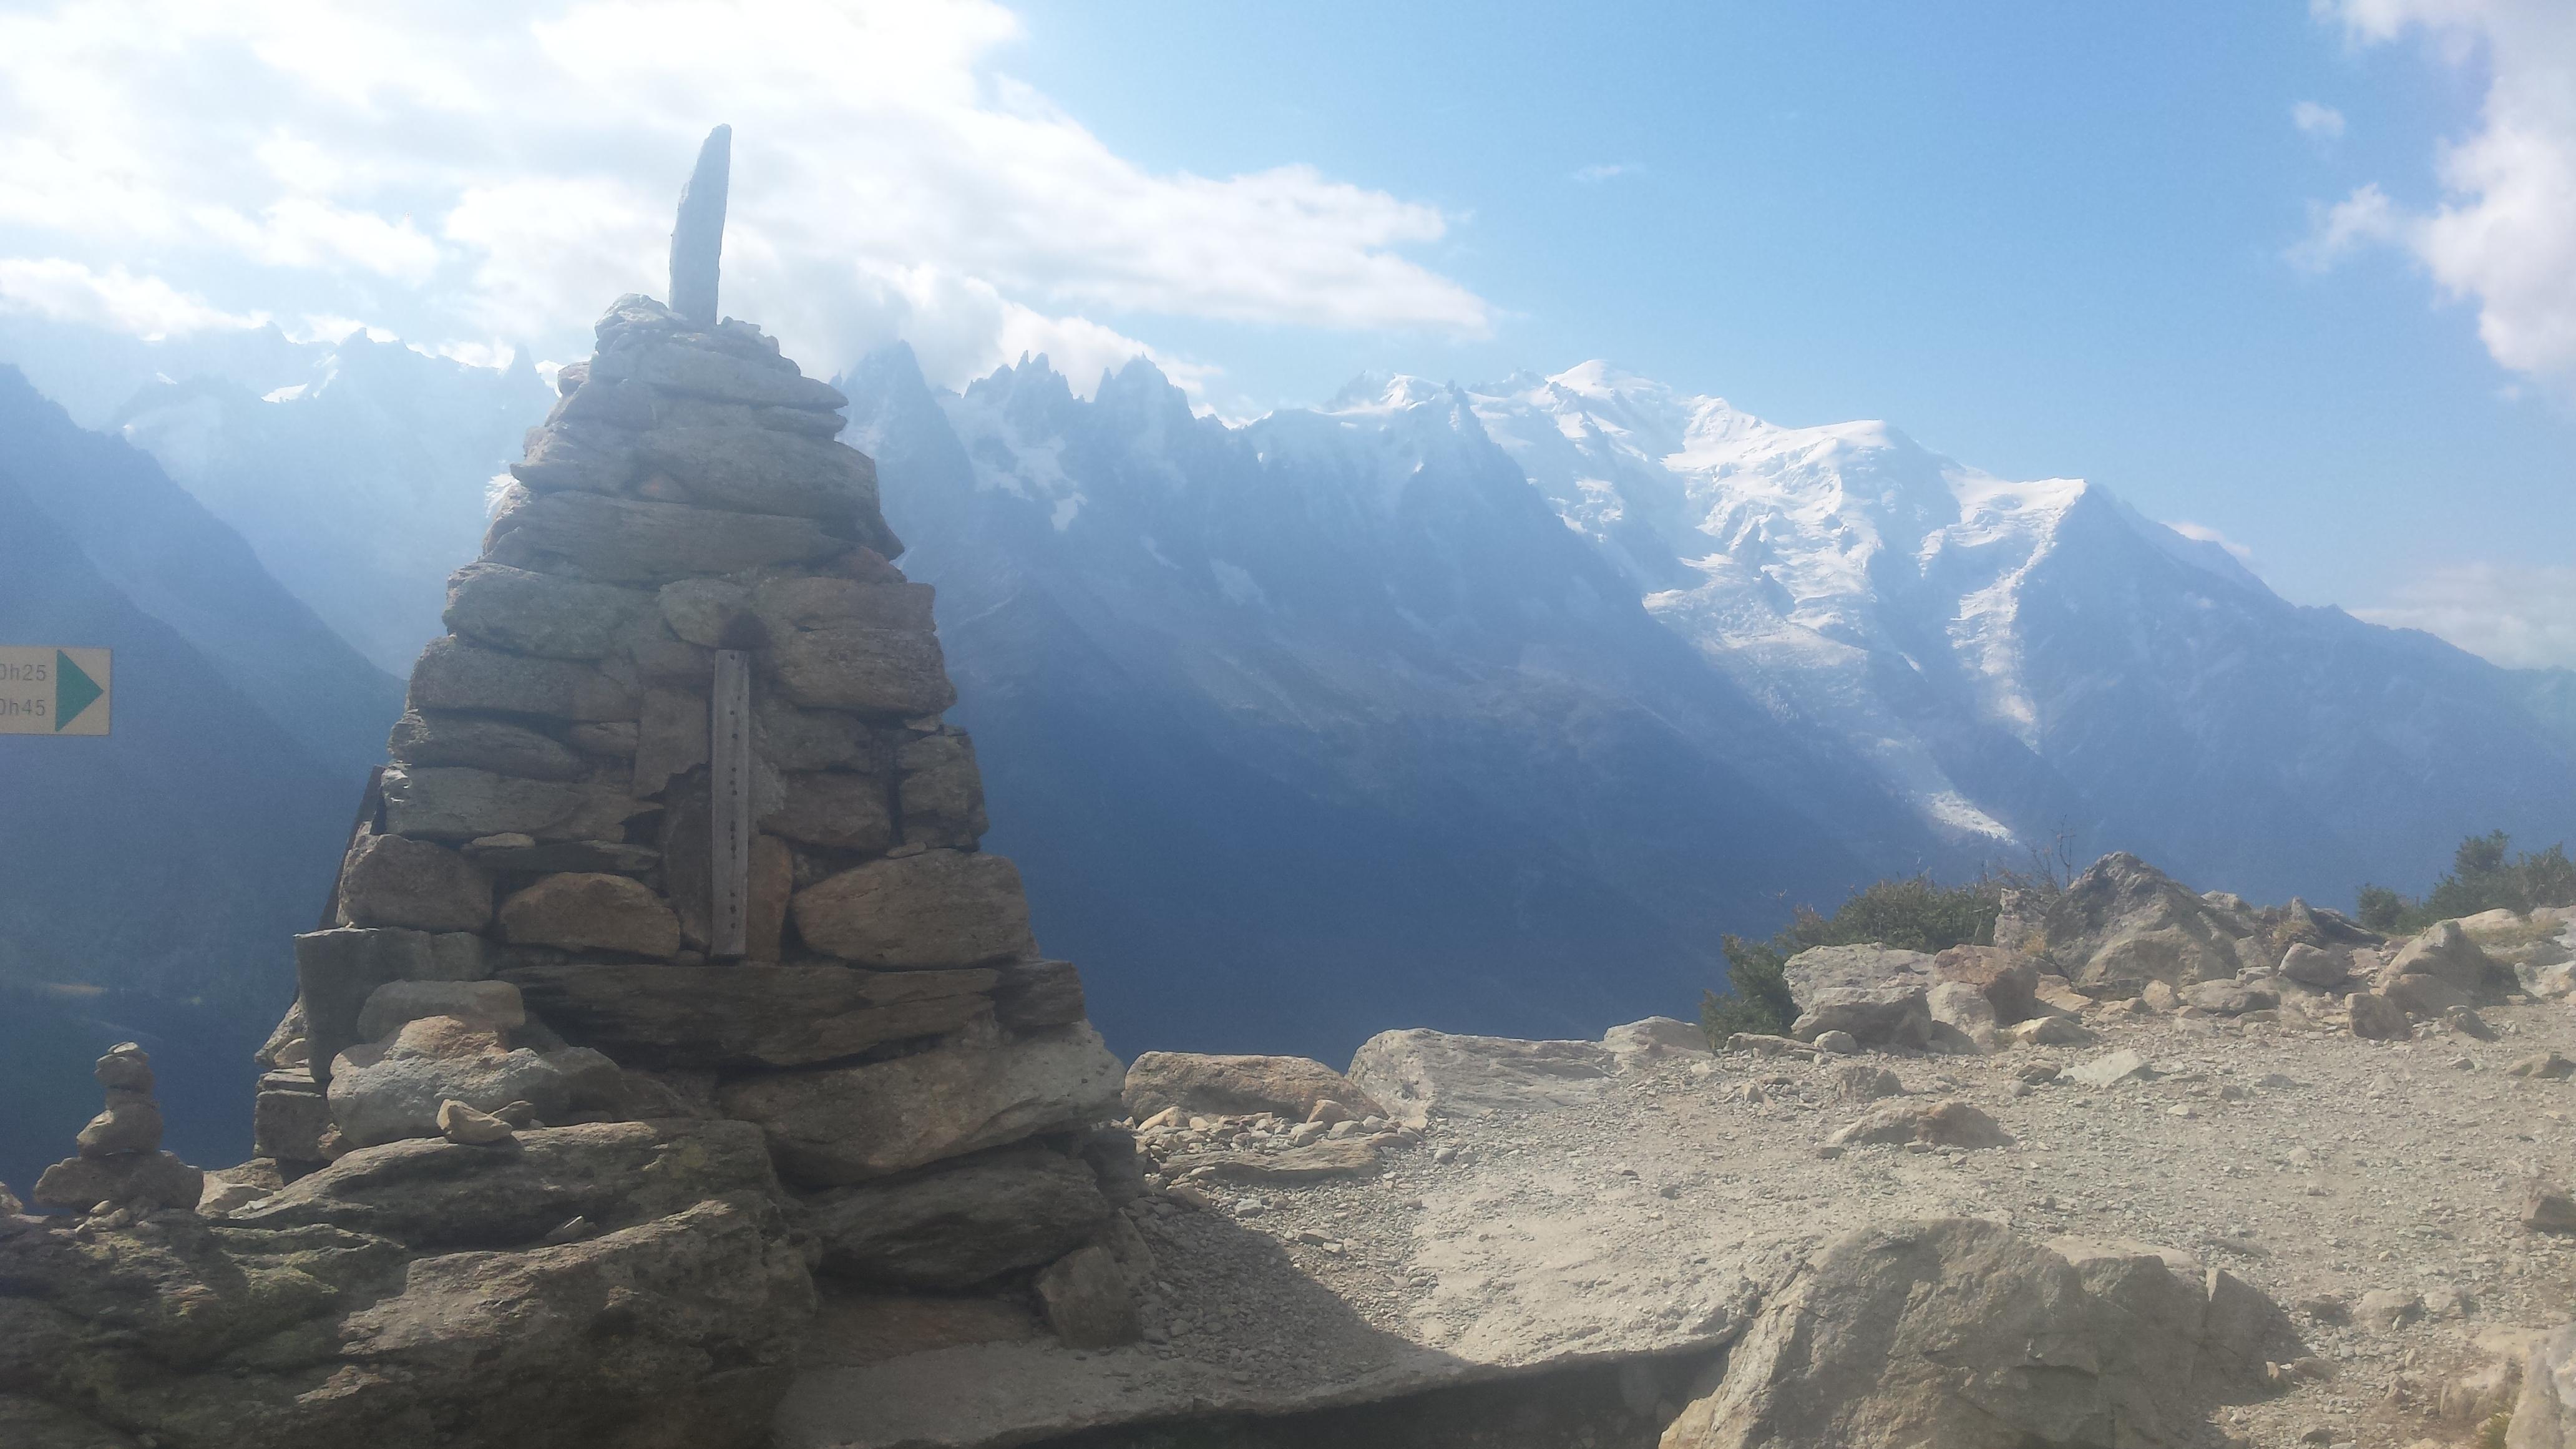 Running the Tour Du Mont Blanc